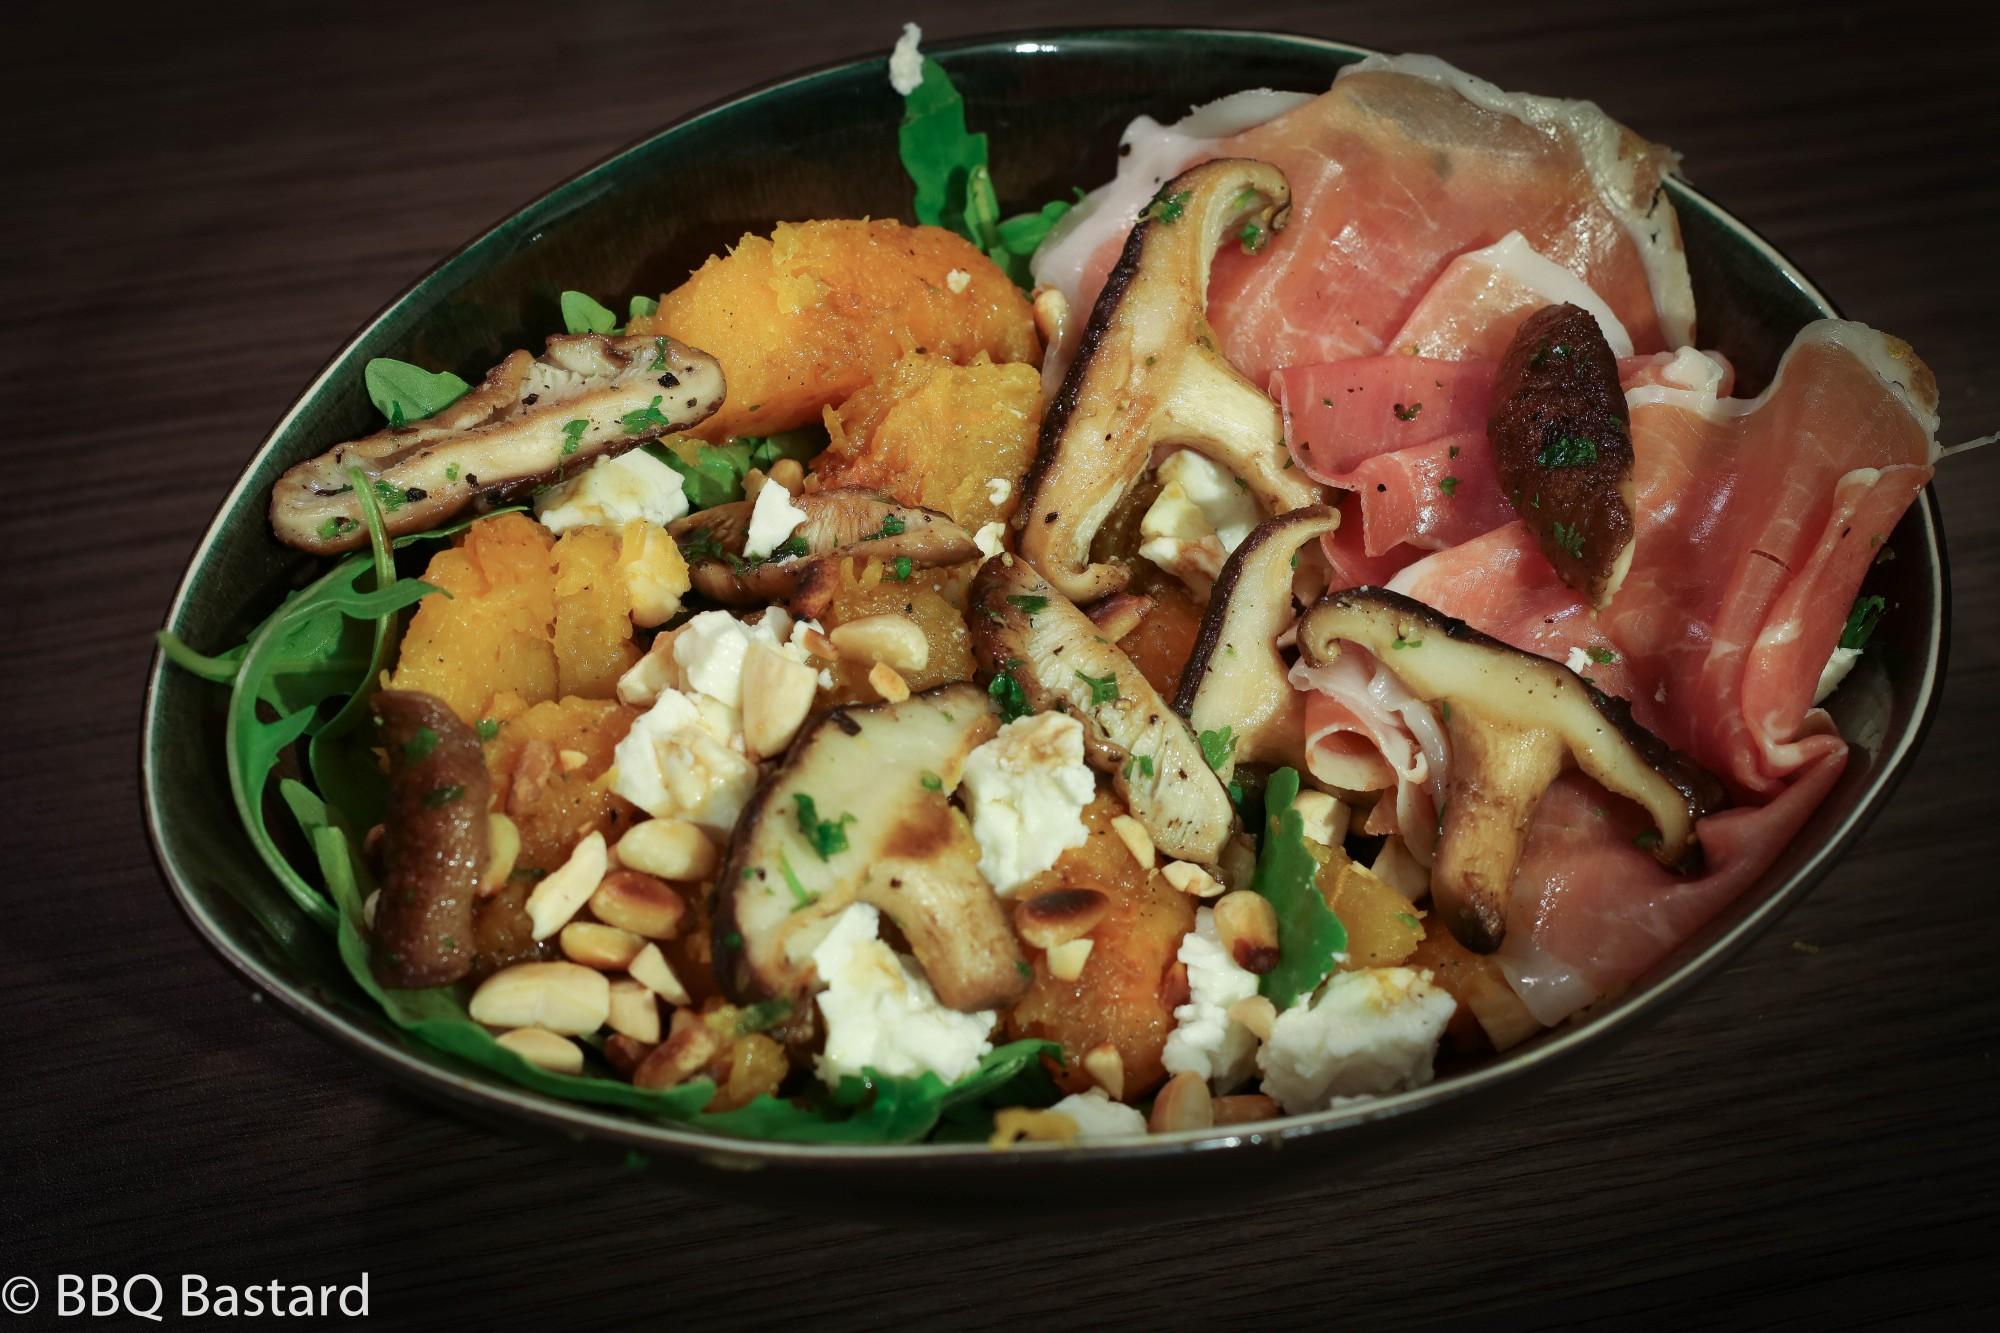 Caveman style Pumpkin Salad